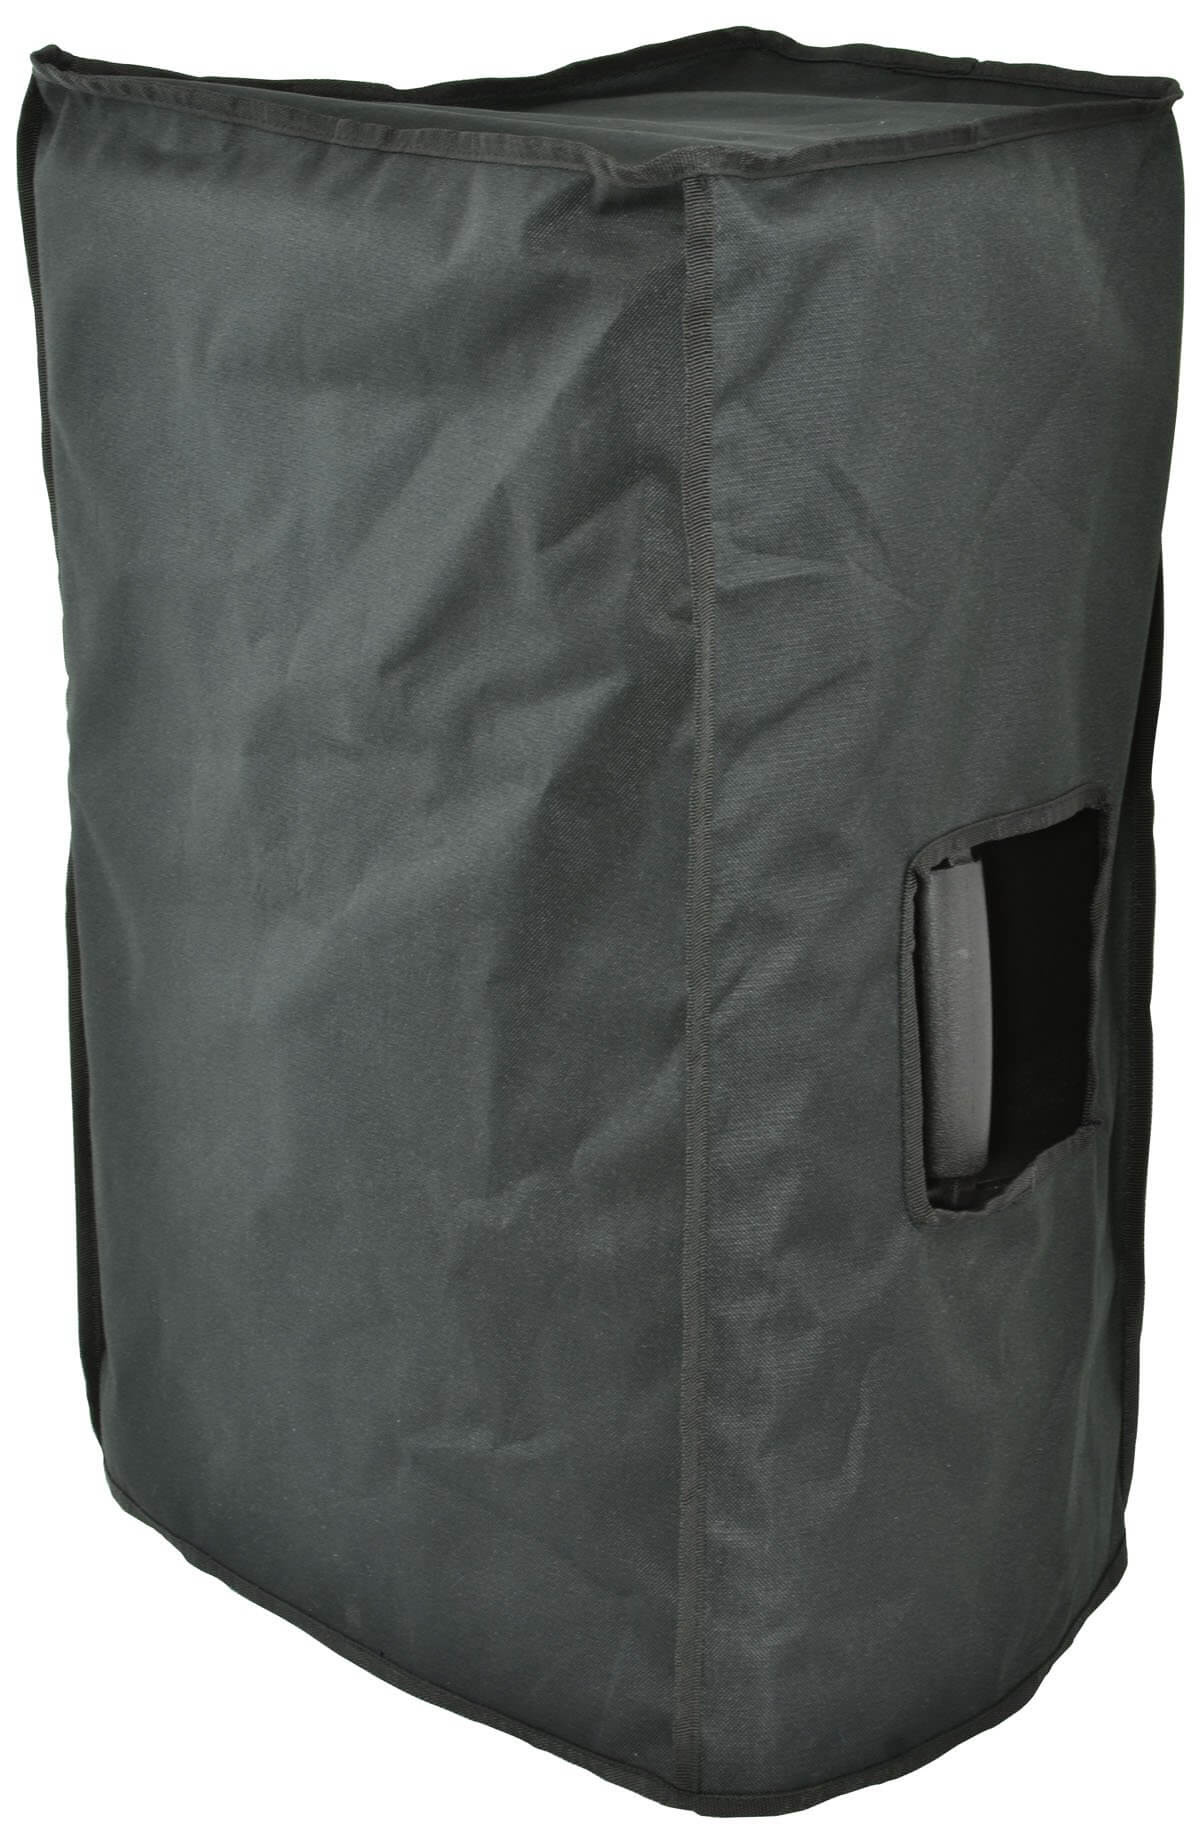 QTX QS12 QS12A Speaker Cover Case